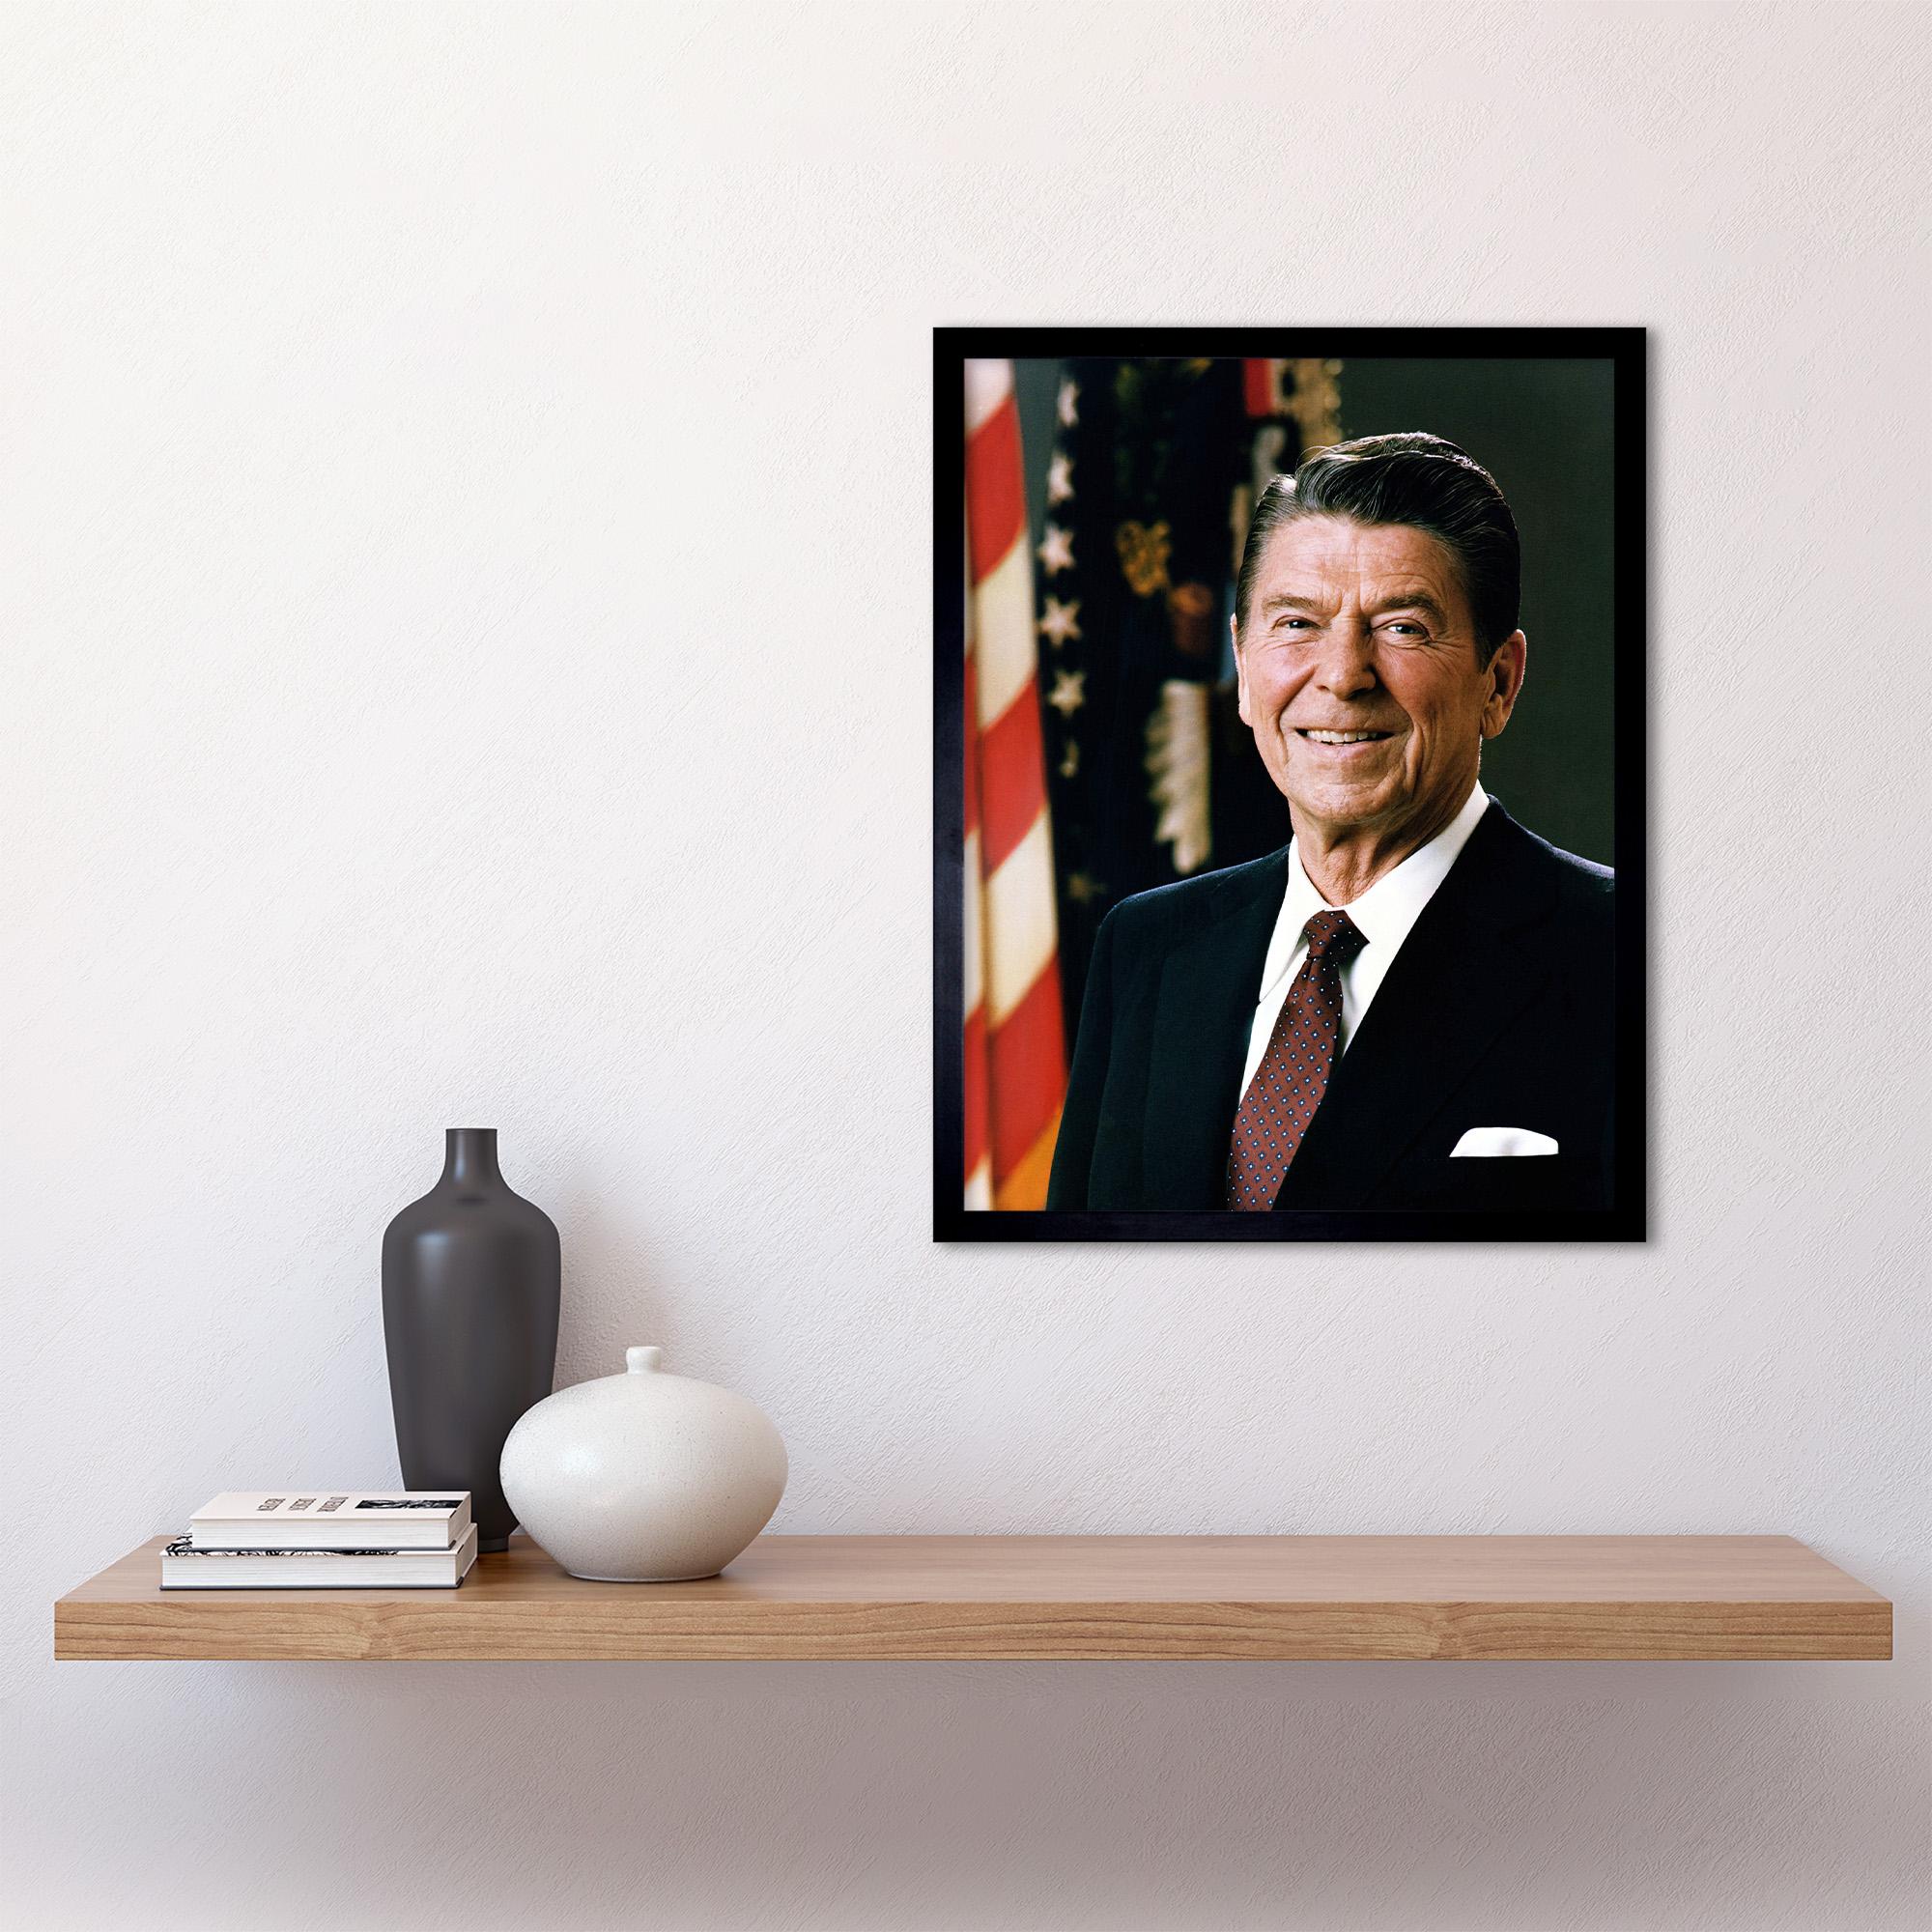 thumbnail 3 - Official-Portrait-US-President-Ronald-Reagan-Photo-Wall-Art-Print-Framed-12x16